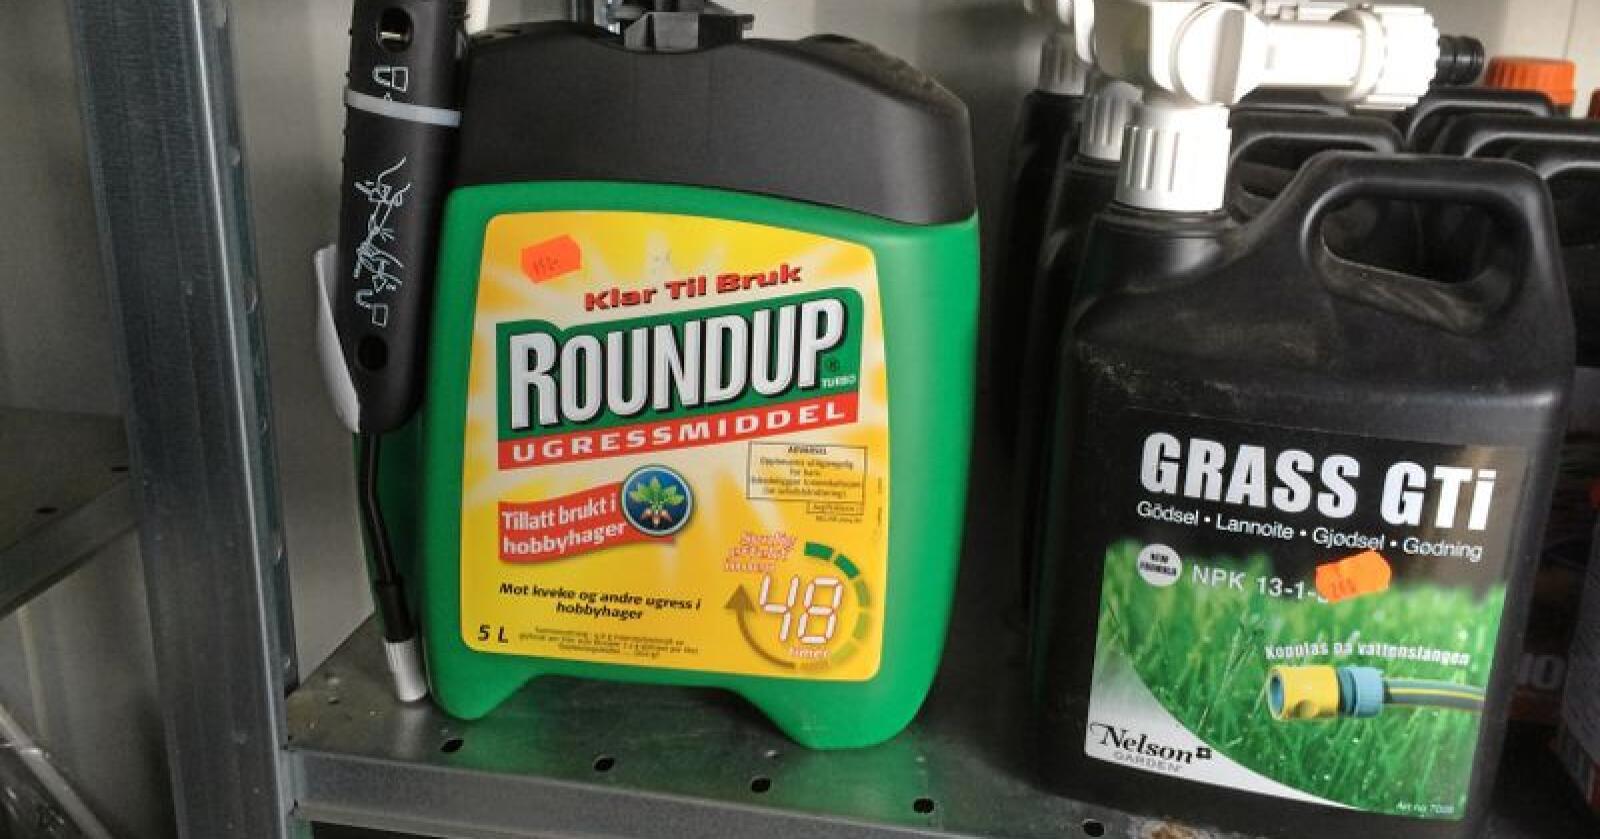 Glyfosat finnes blant annet i Roundup. Foto: Svein Egil Hatlevik